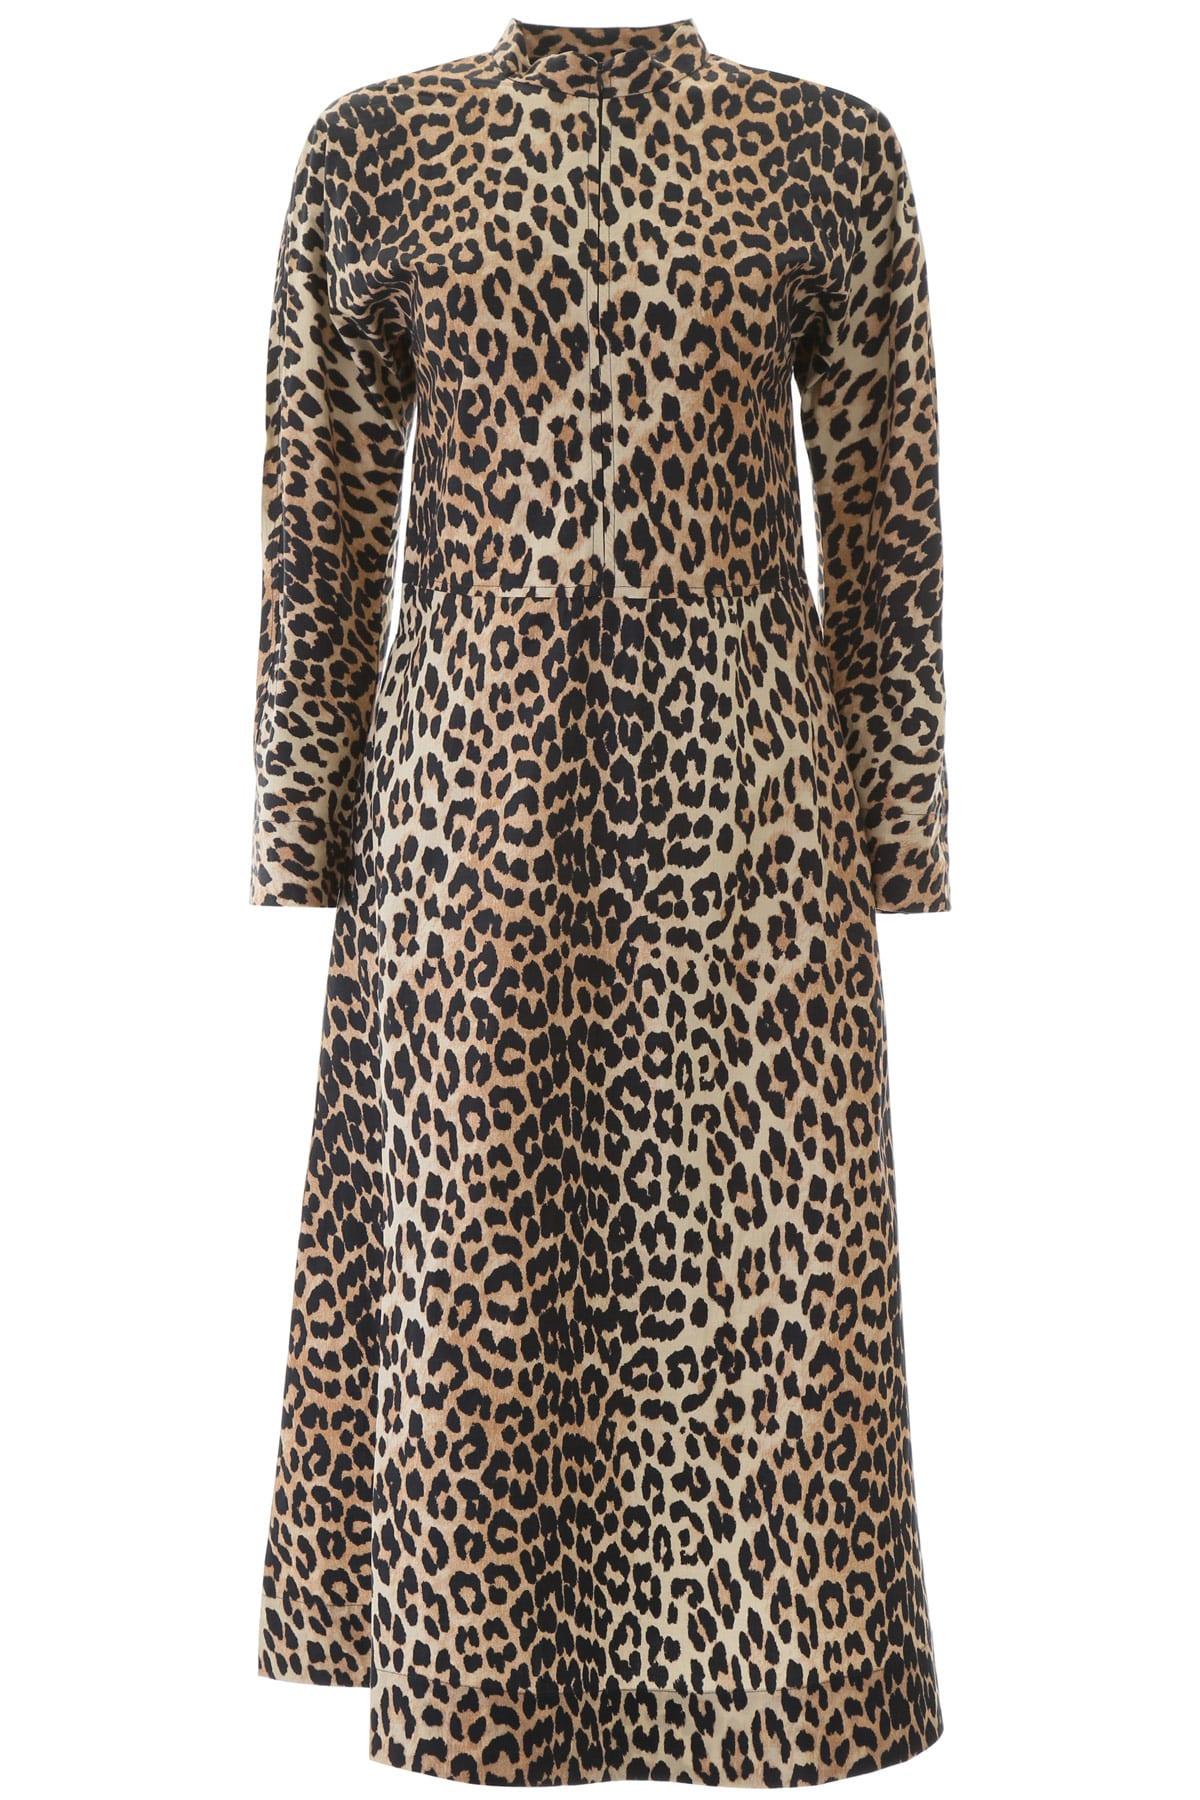 Buy Ganni Animal Print Midi Dress online, shop Ganni with free shipping